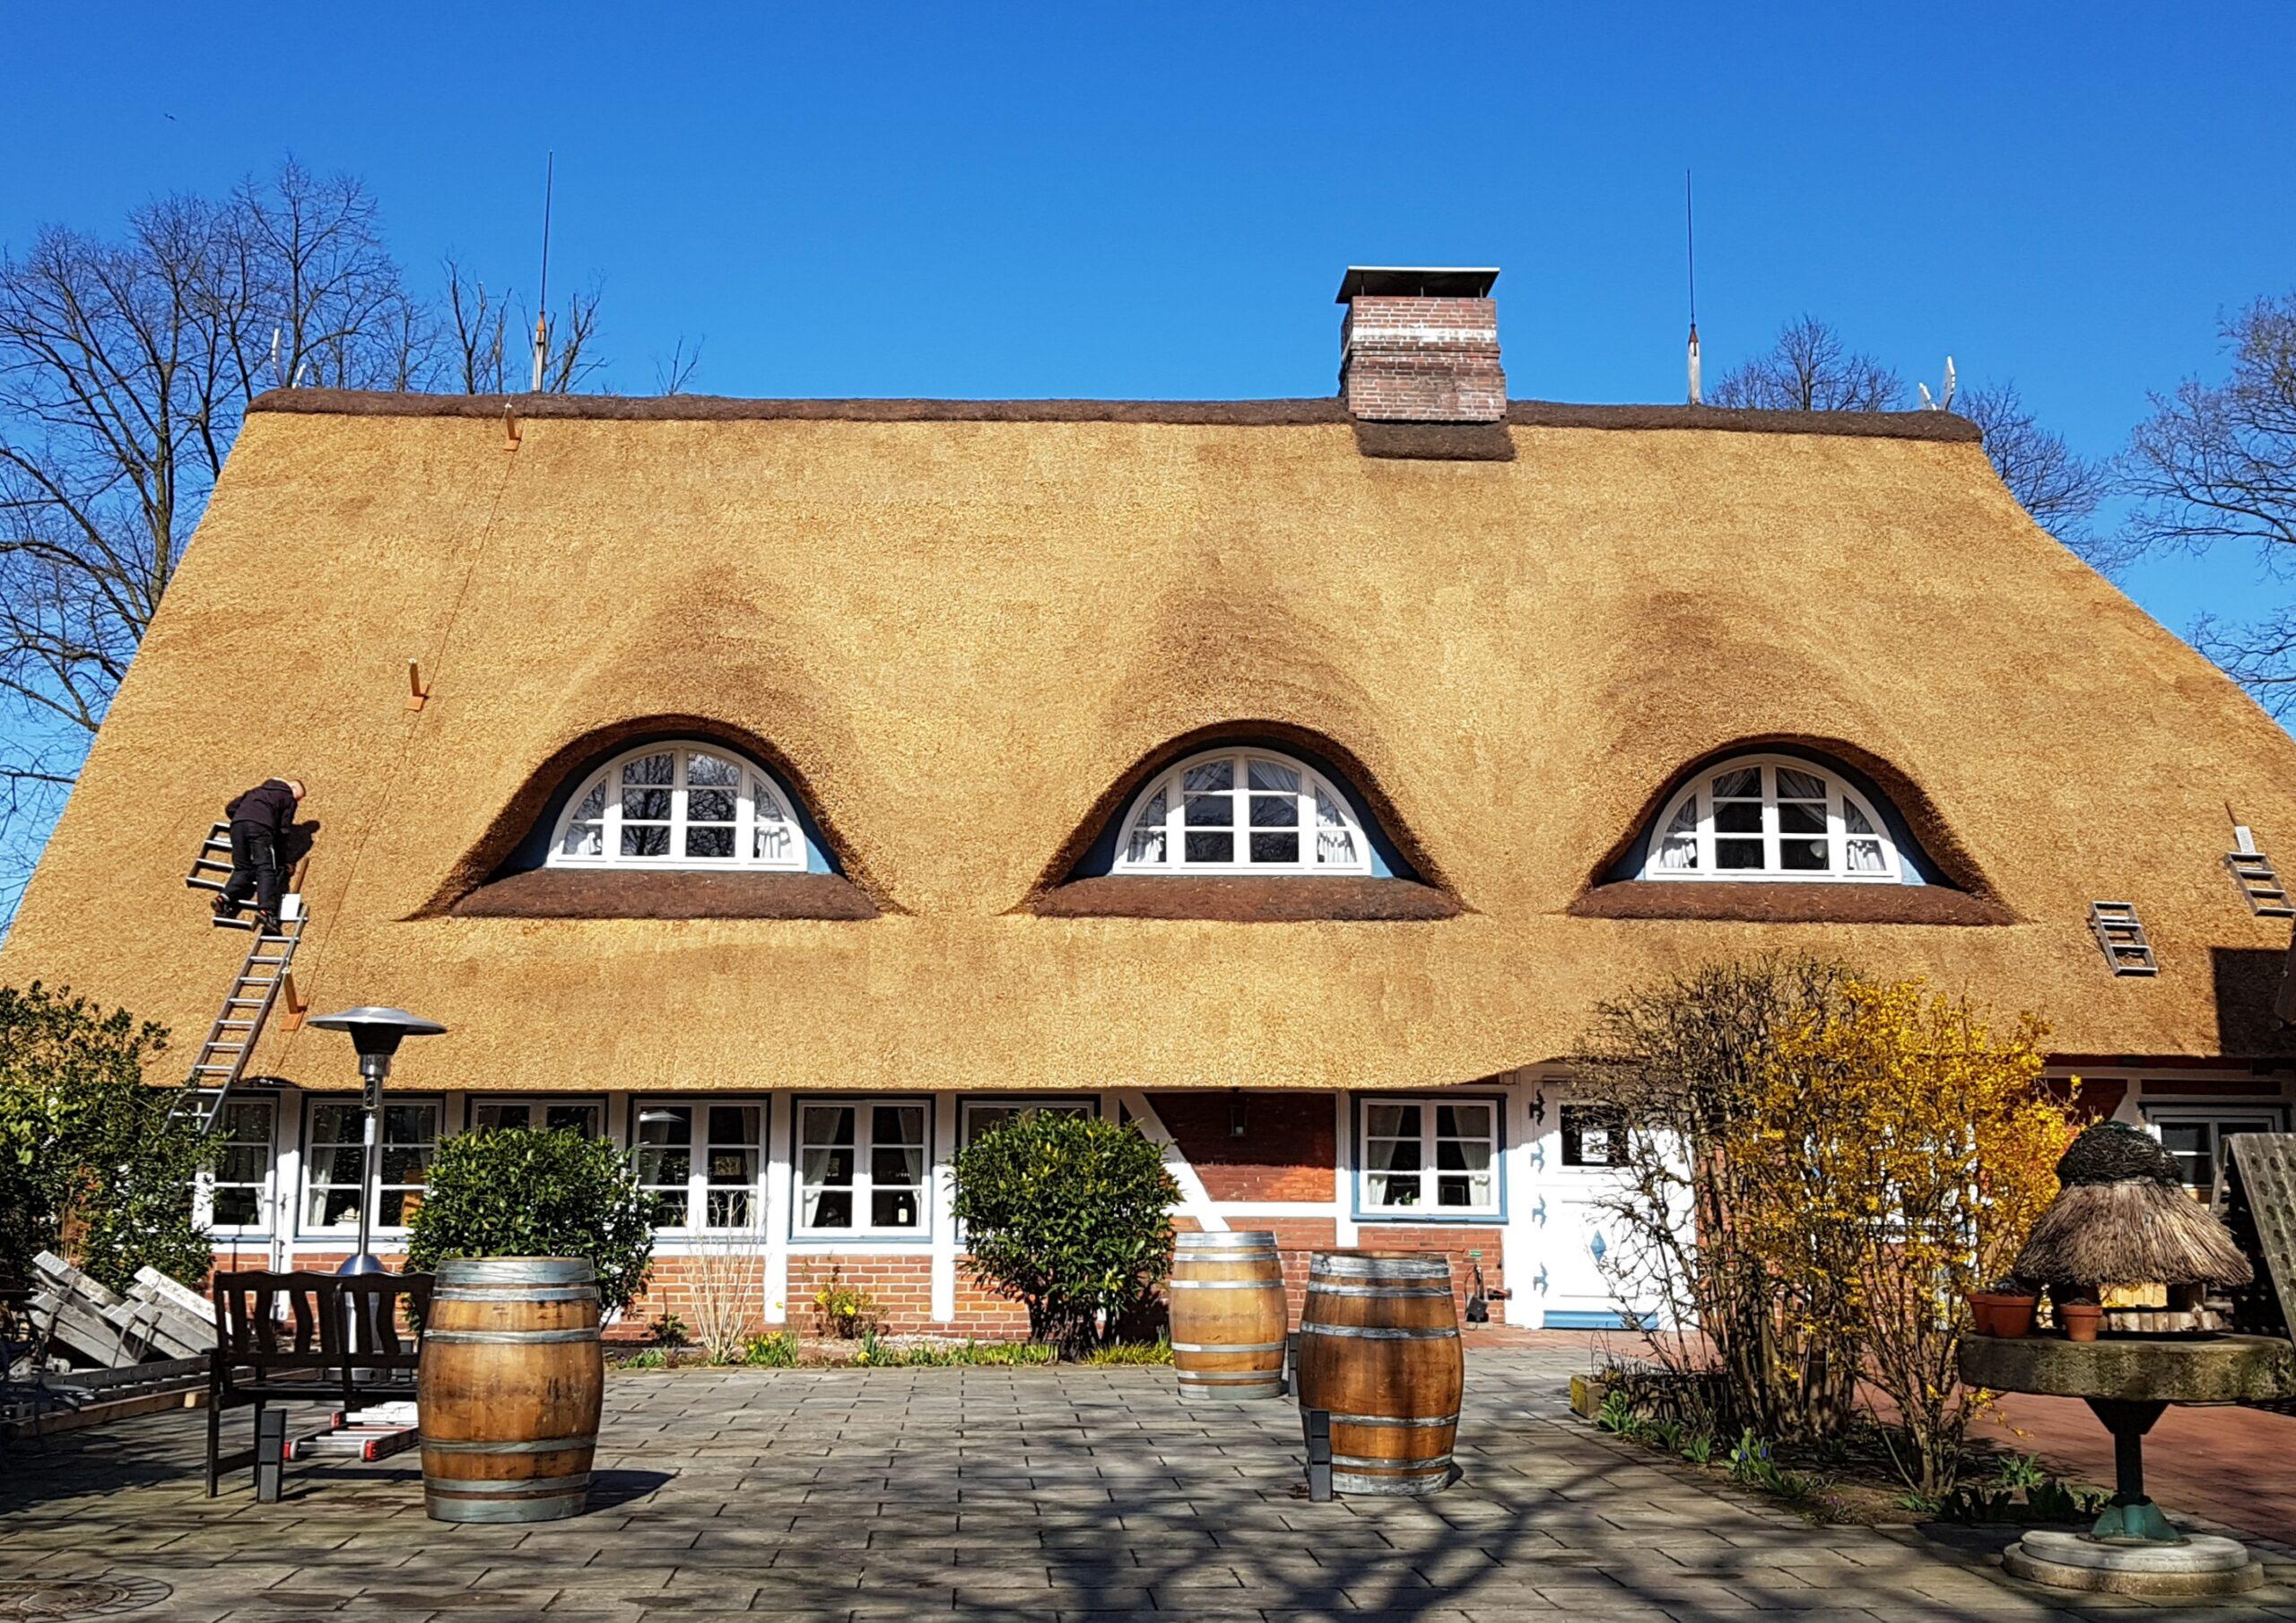 Reetdachdeckerei-Ehmann-Wedel-Alsterau 2